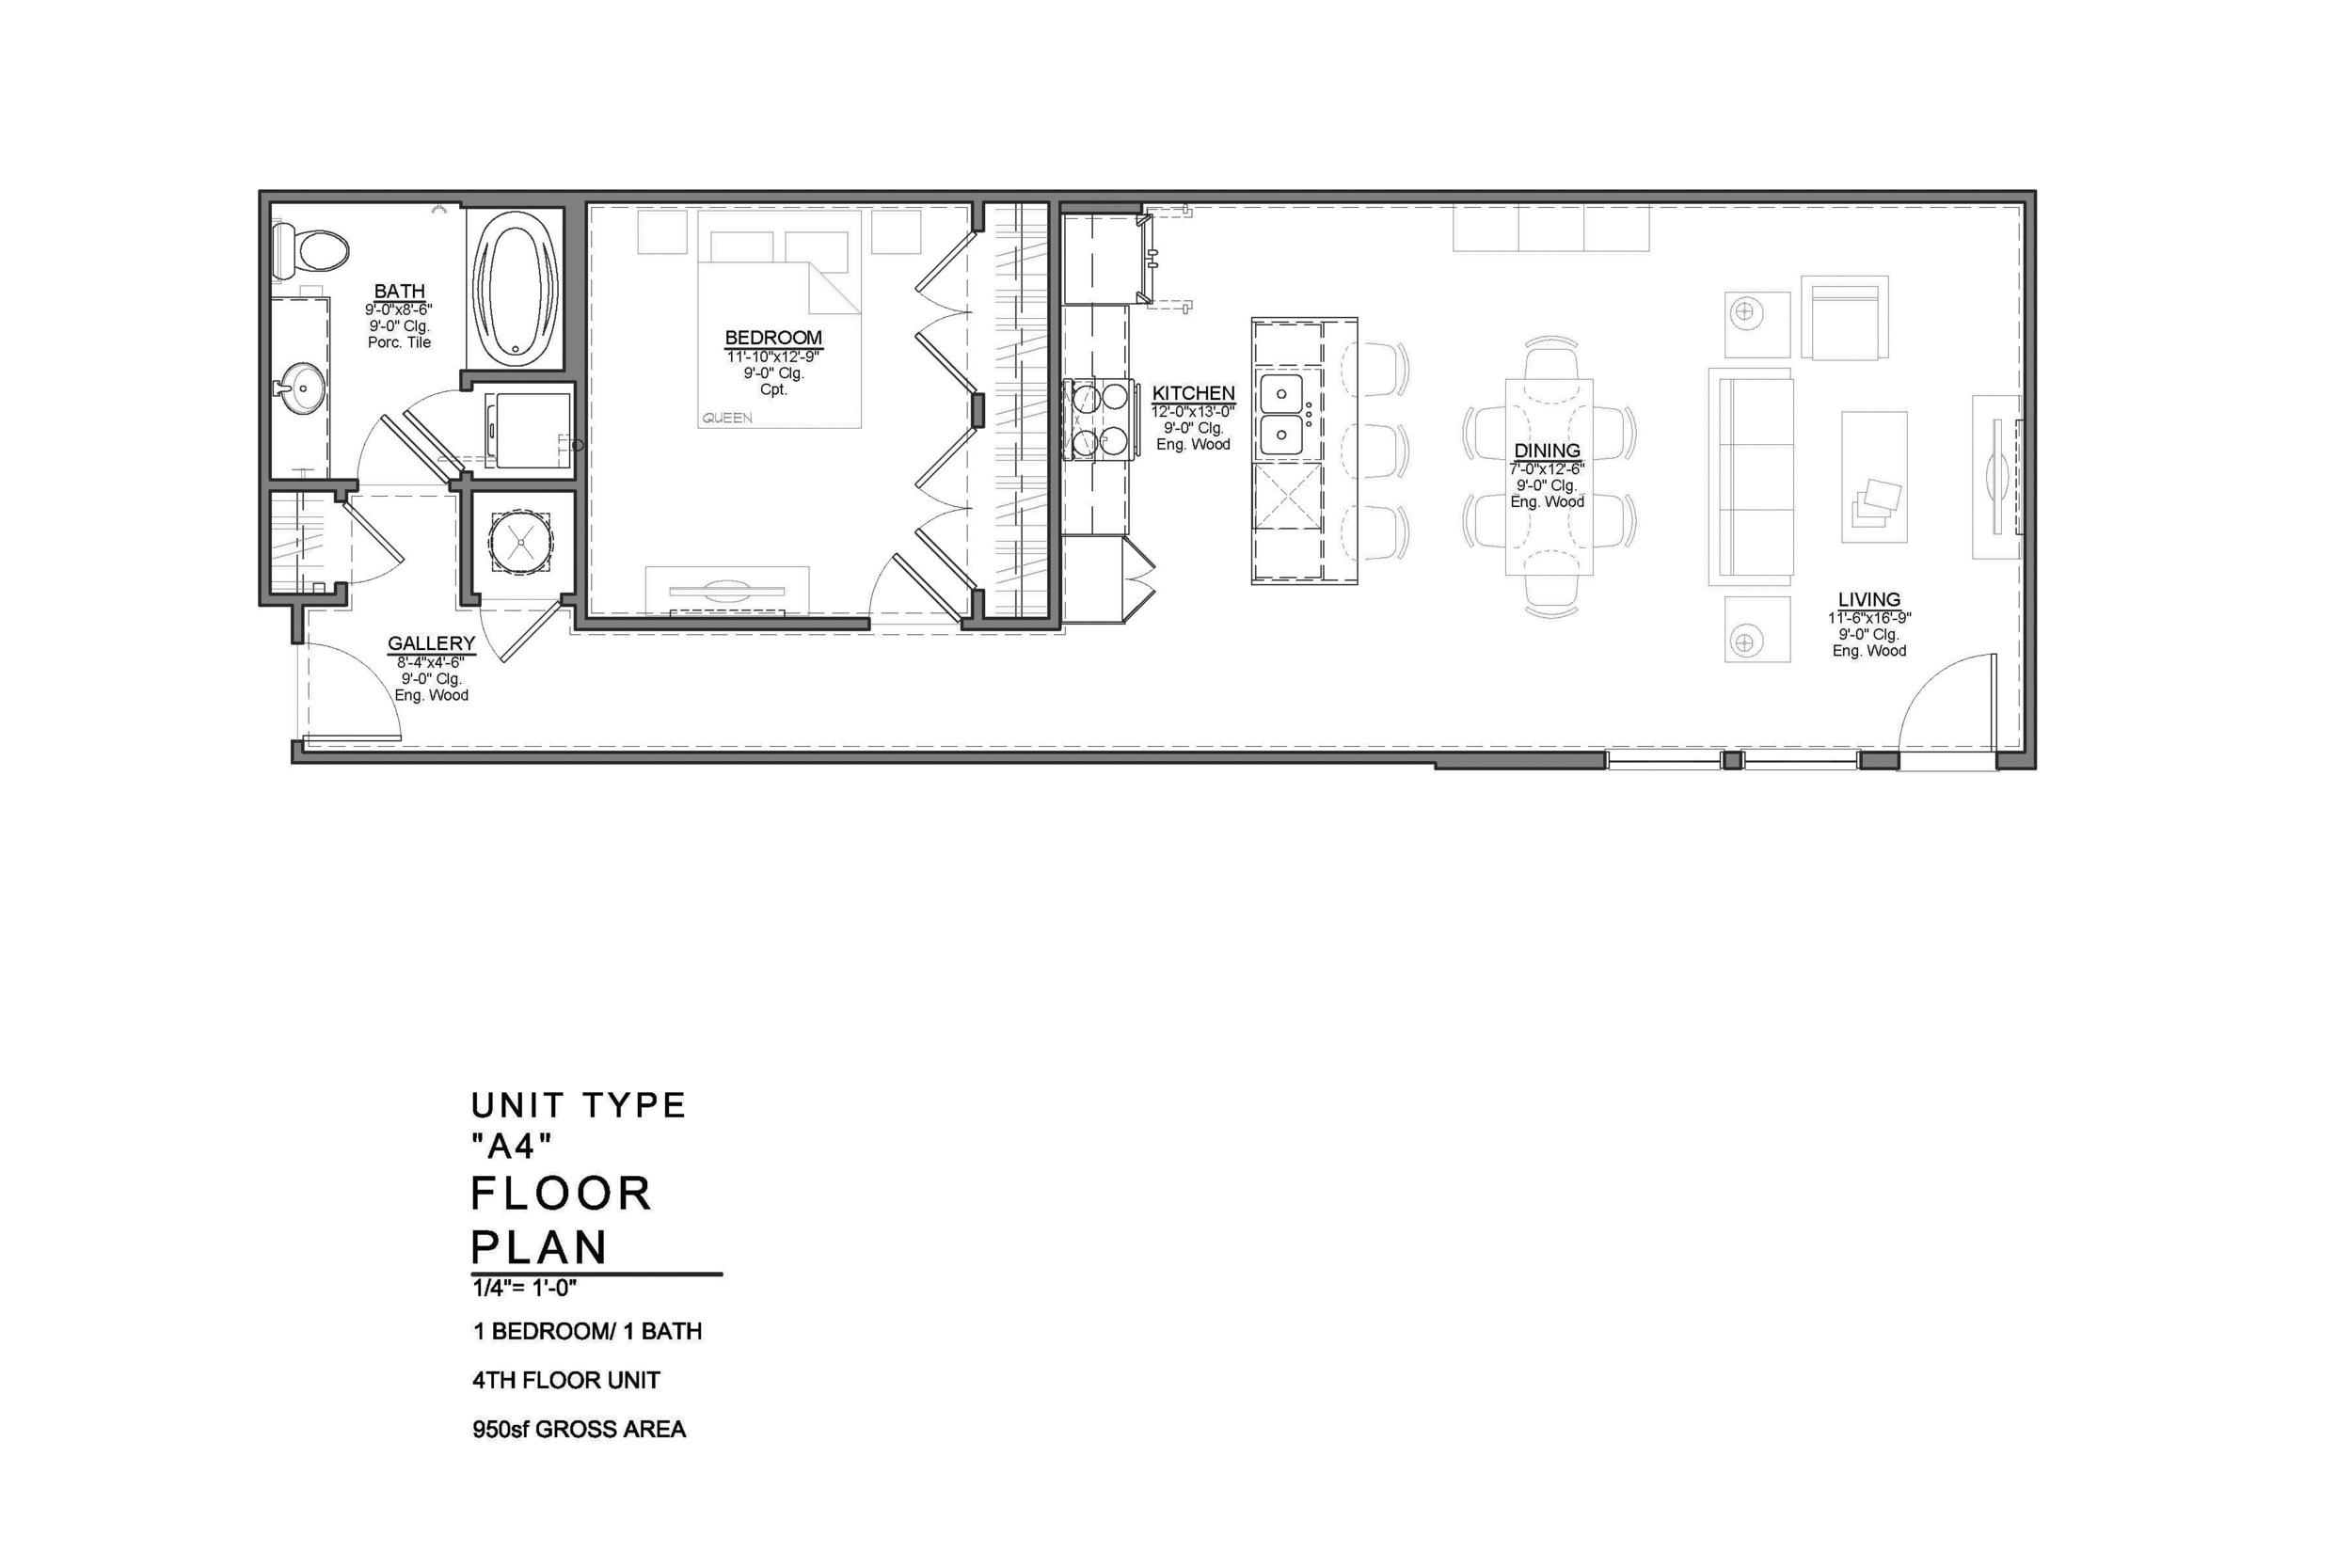 A4 FLOOR PLAN: 1 BEDROOM / 1 BATH